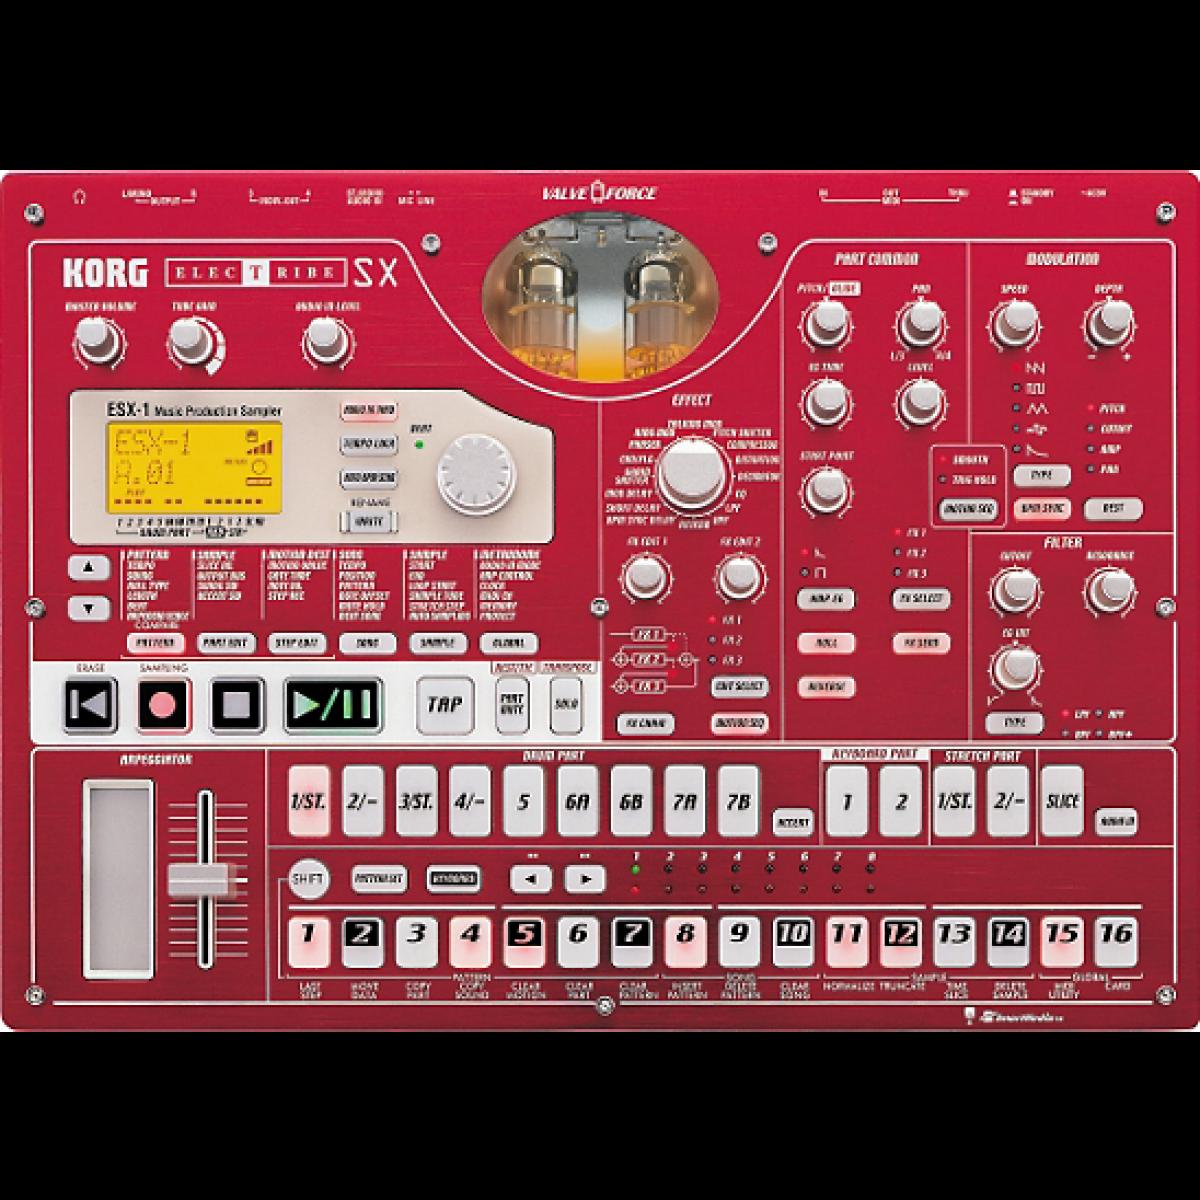 korg electribe esx-1 | buy music production sampler | best price